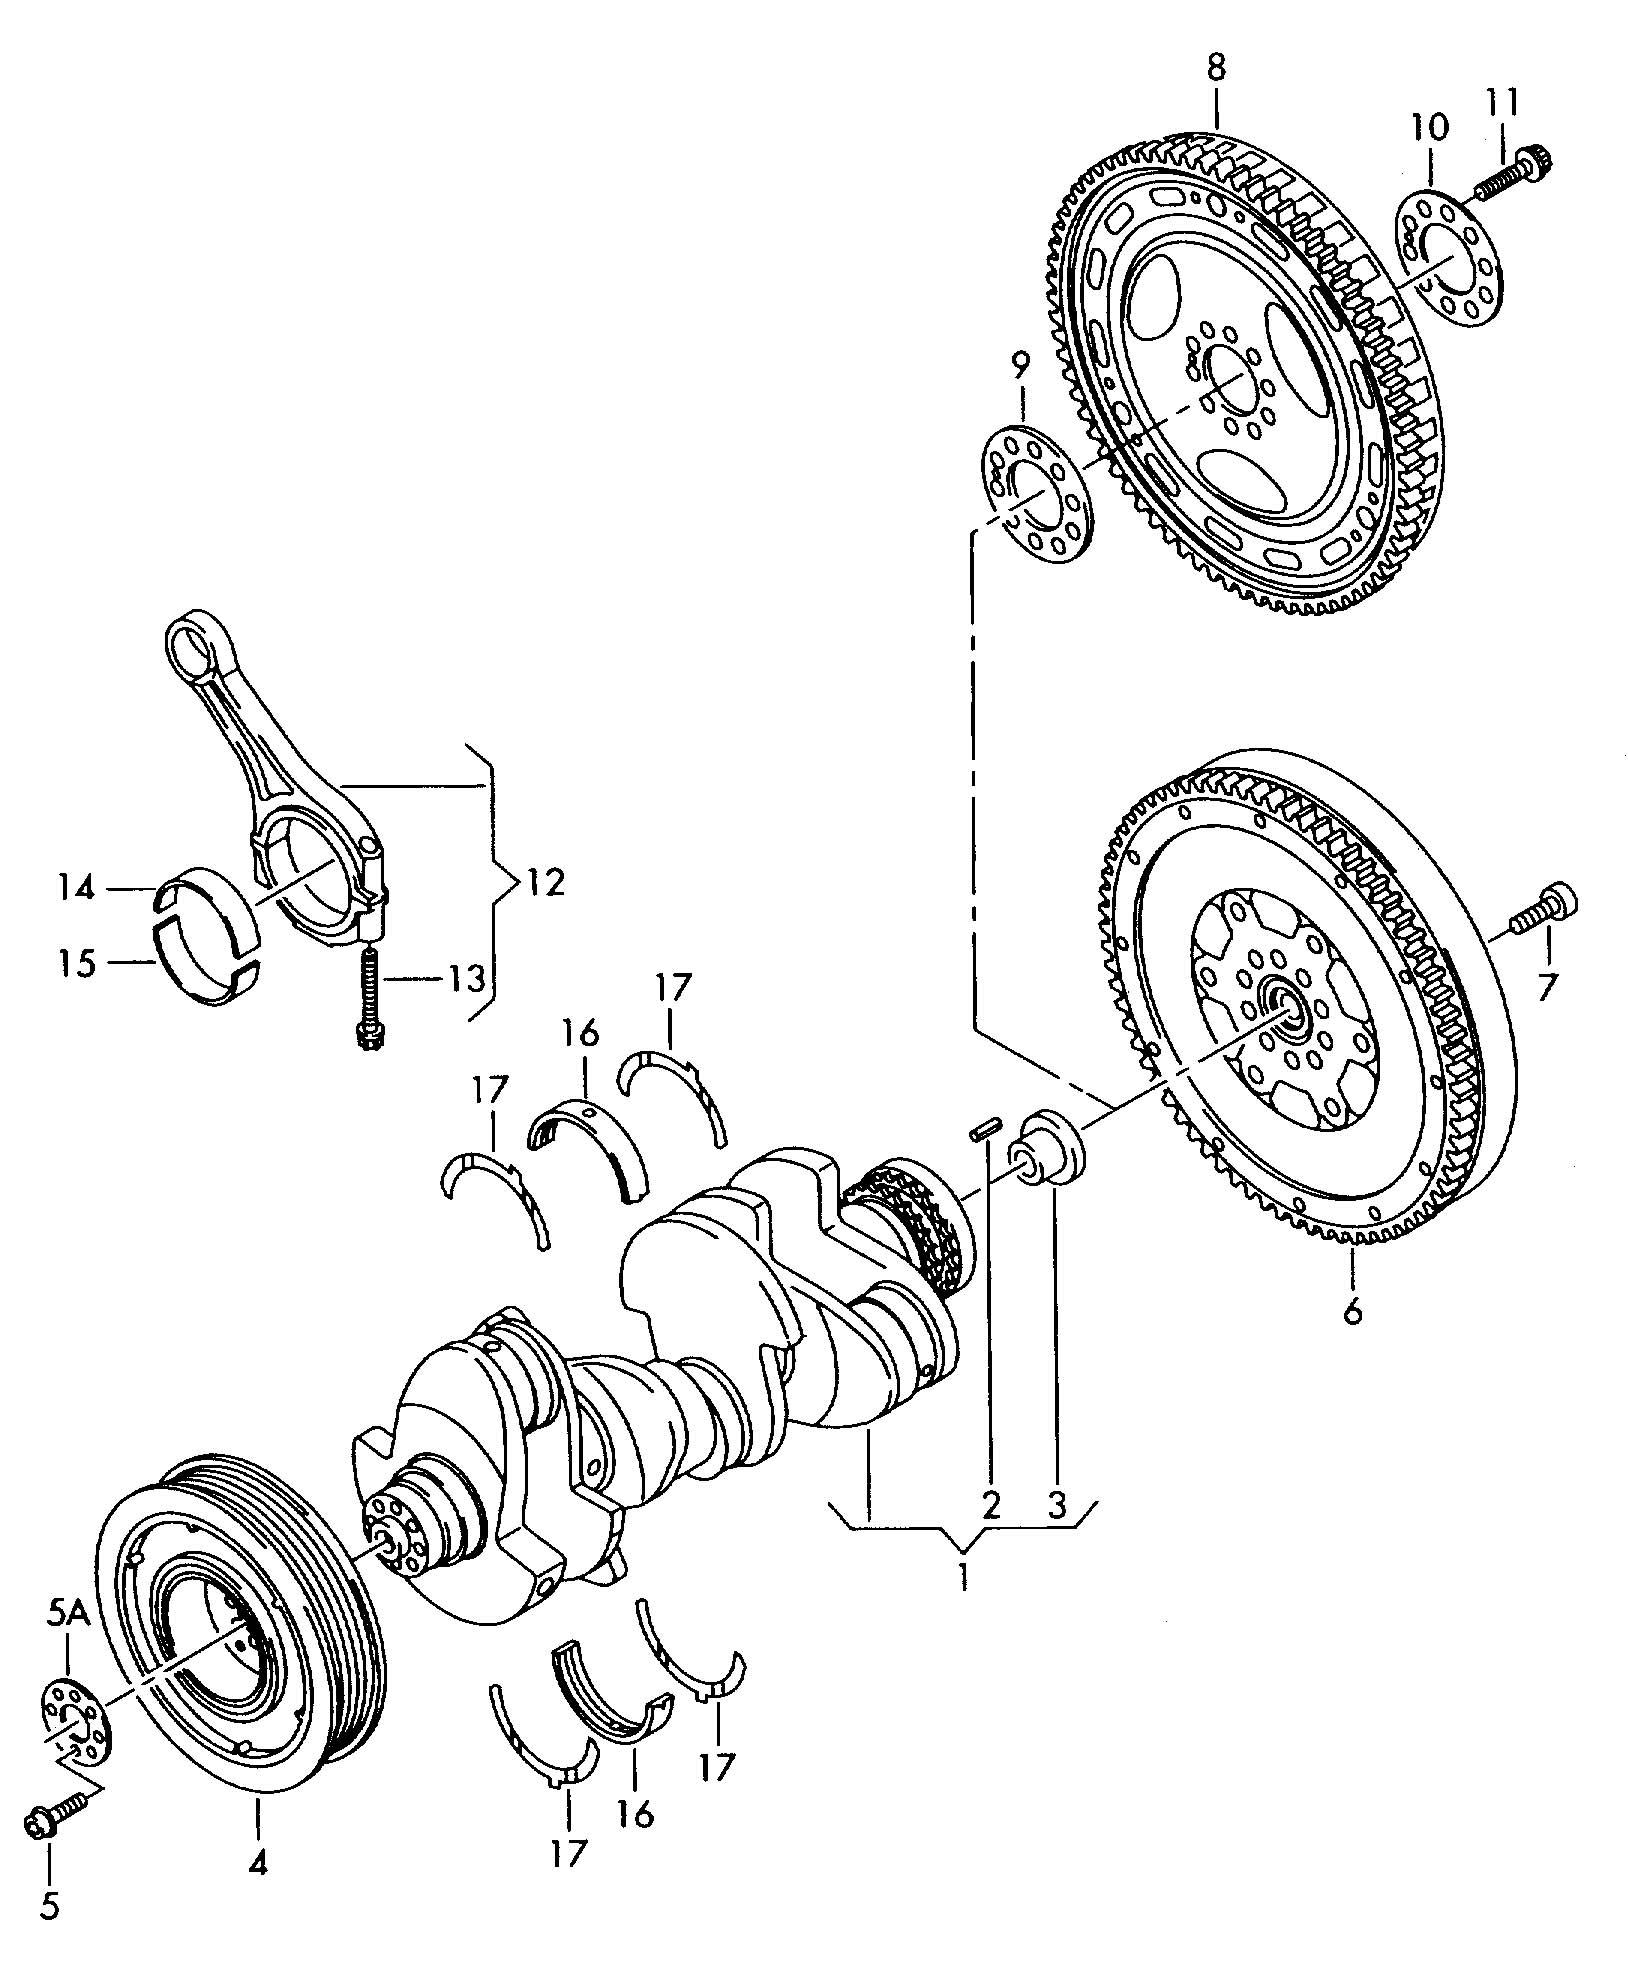 Dm950d Engine Manual